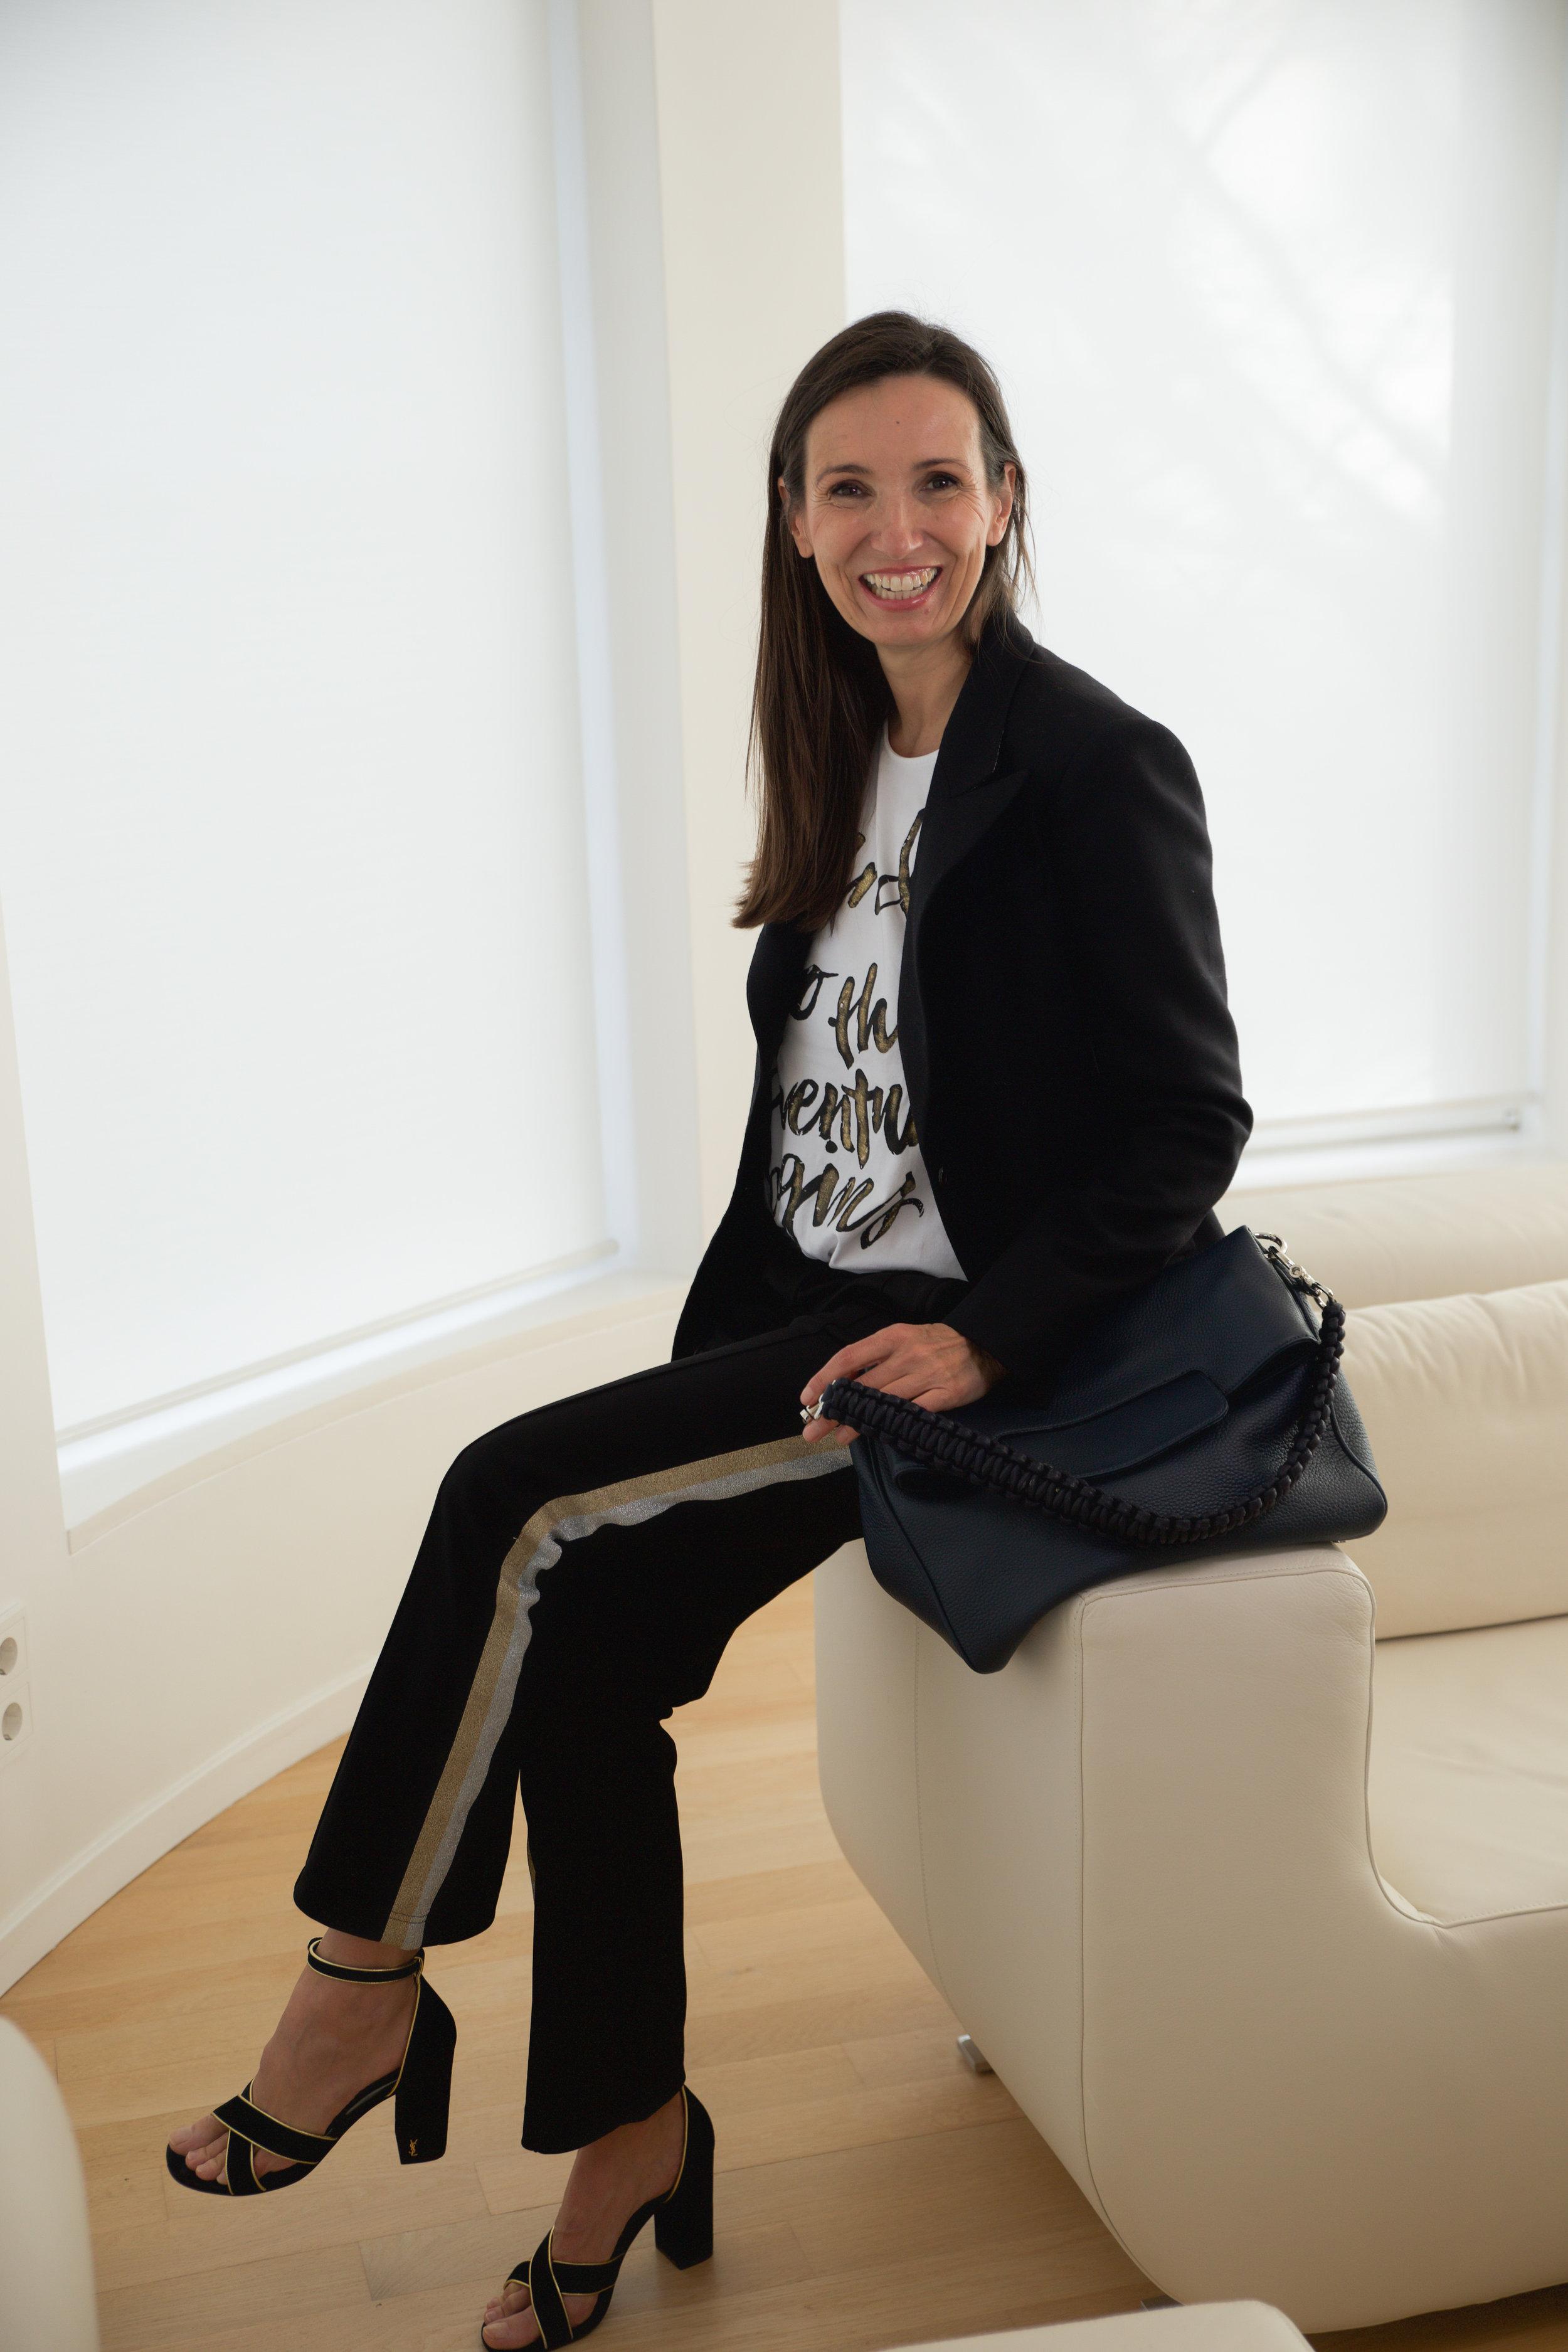 Liv Bergen Look Styling Jogginghose BeFifty Mode für Frauen über 50